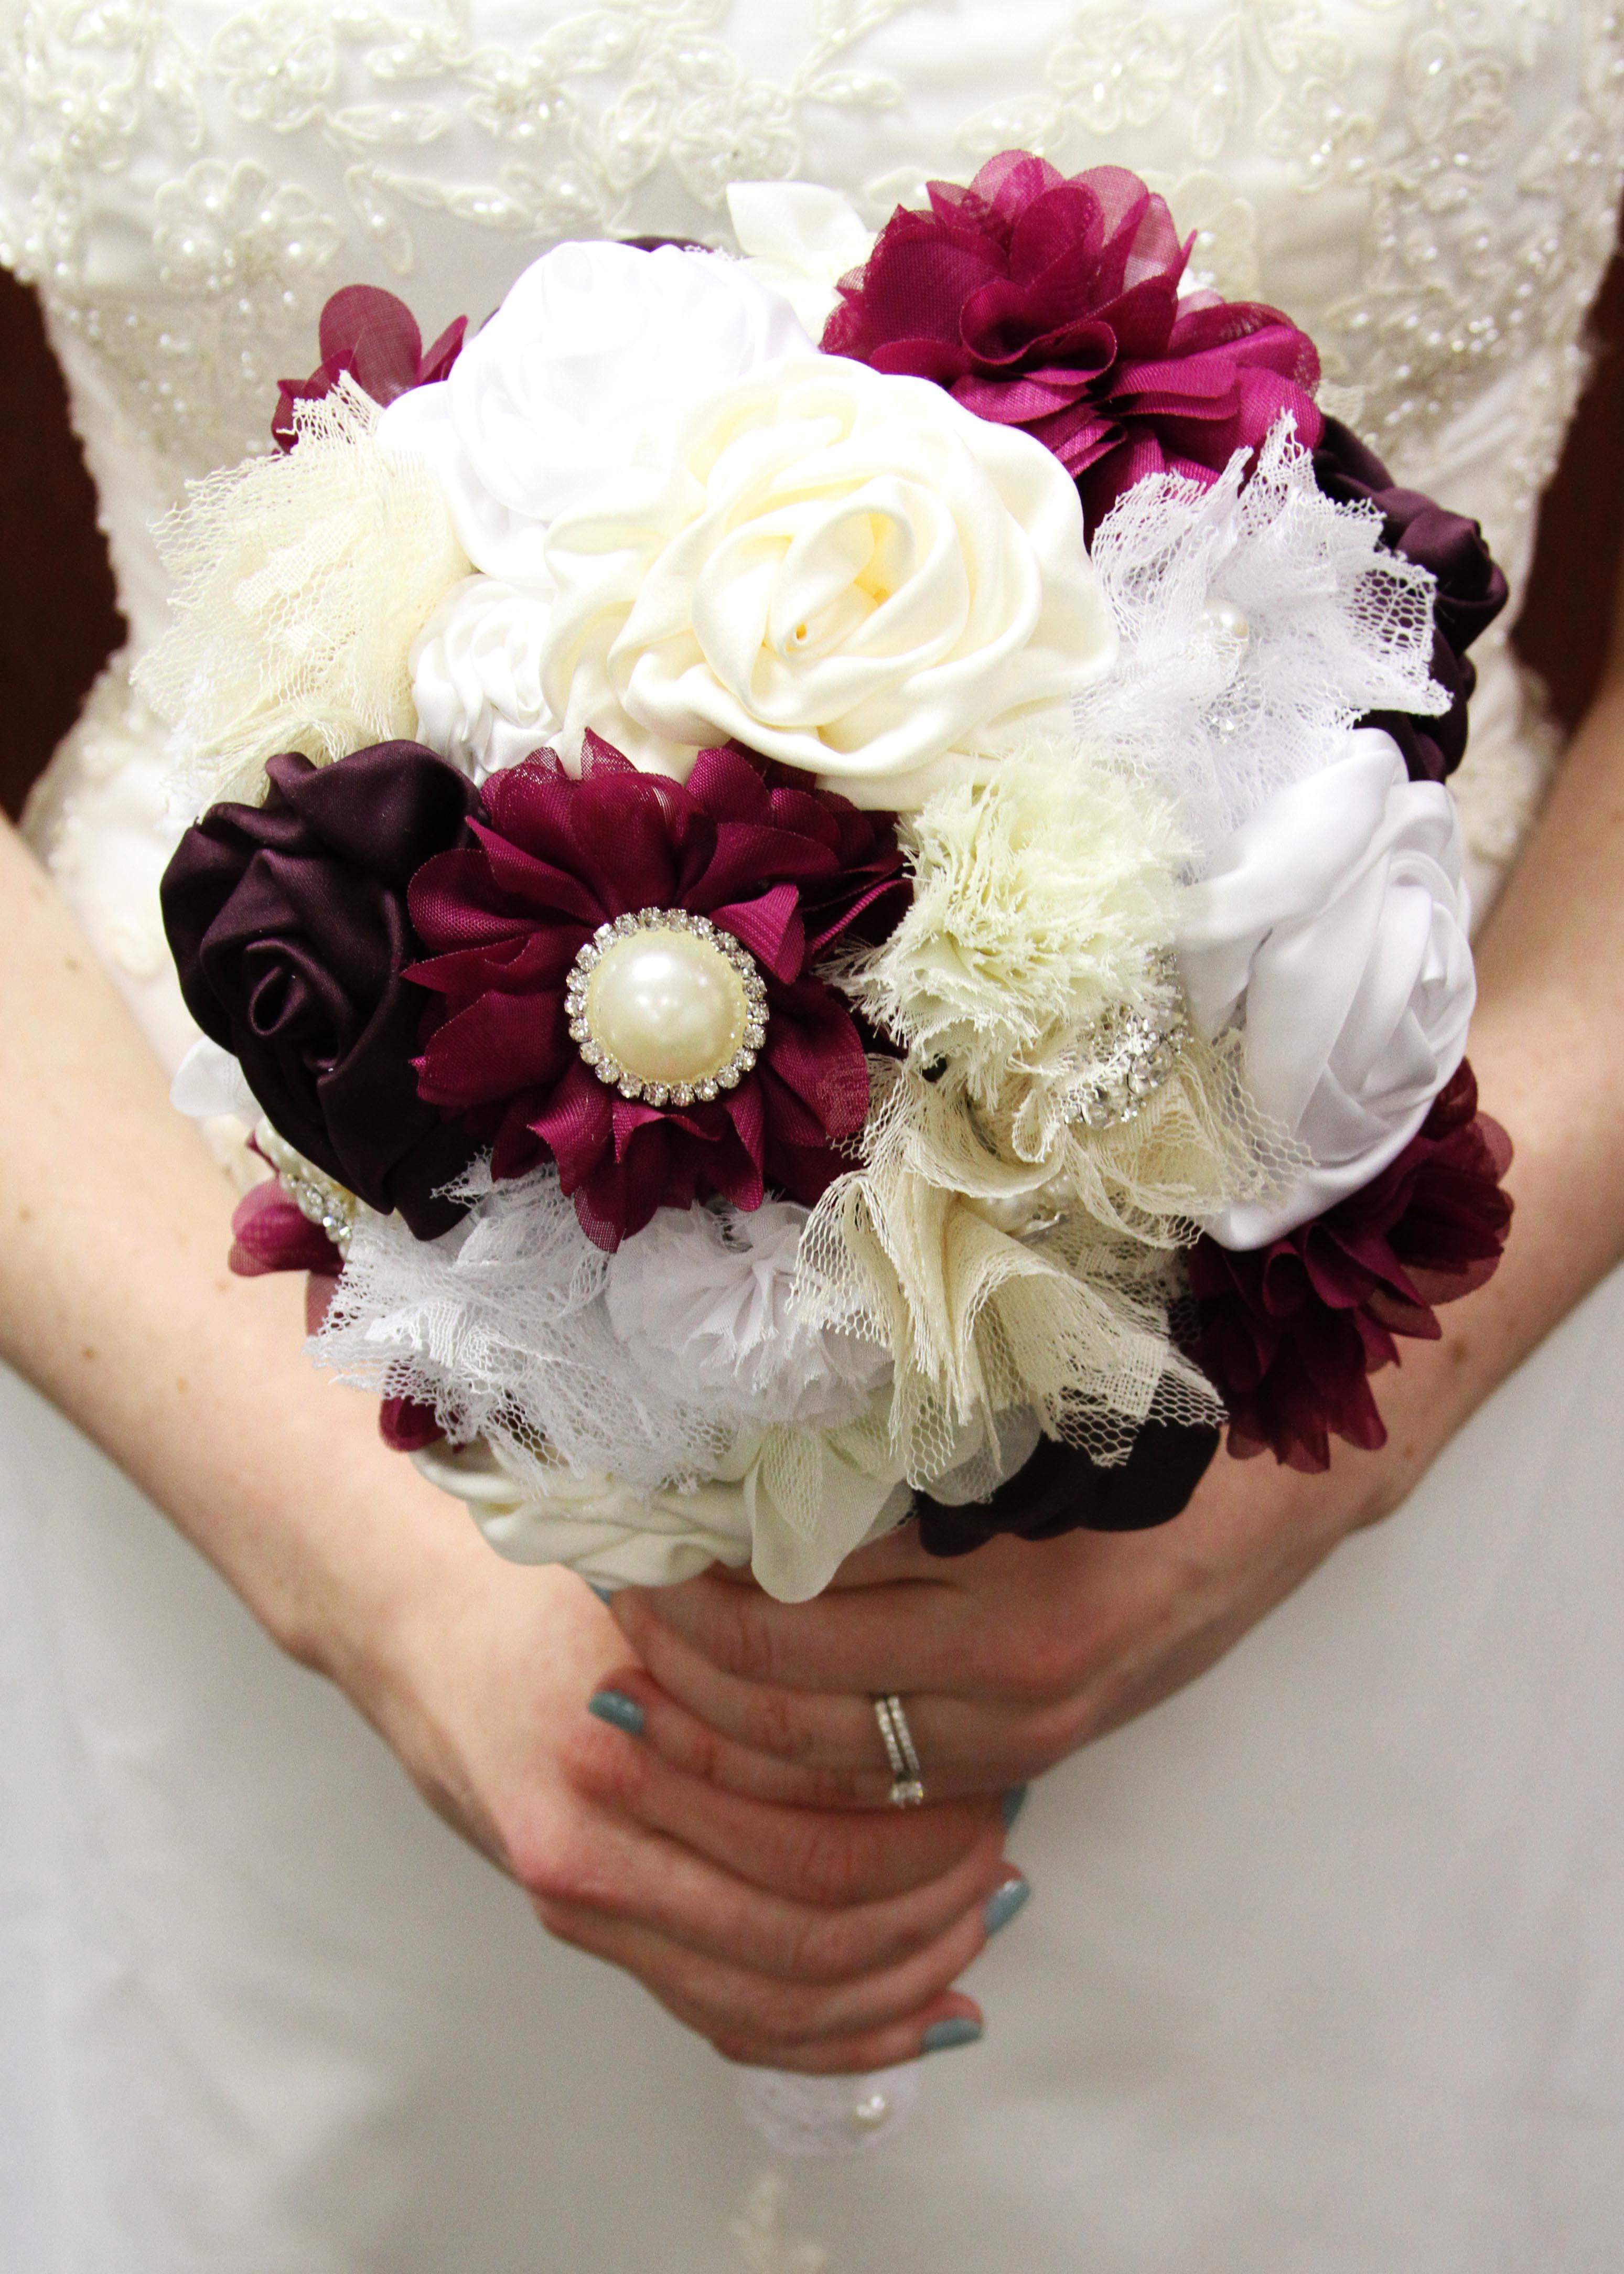 Best ideas about DIY Flower Wedding . Save or Pin DIY Wedding Bouquet Bridal Tutorial Now.